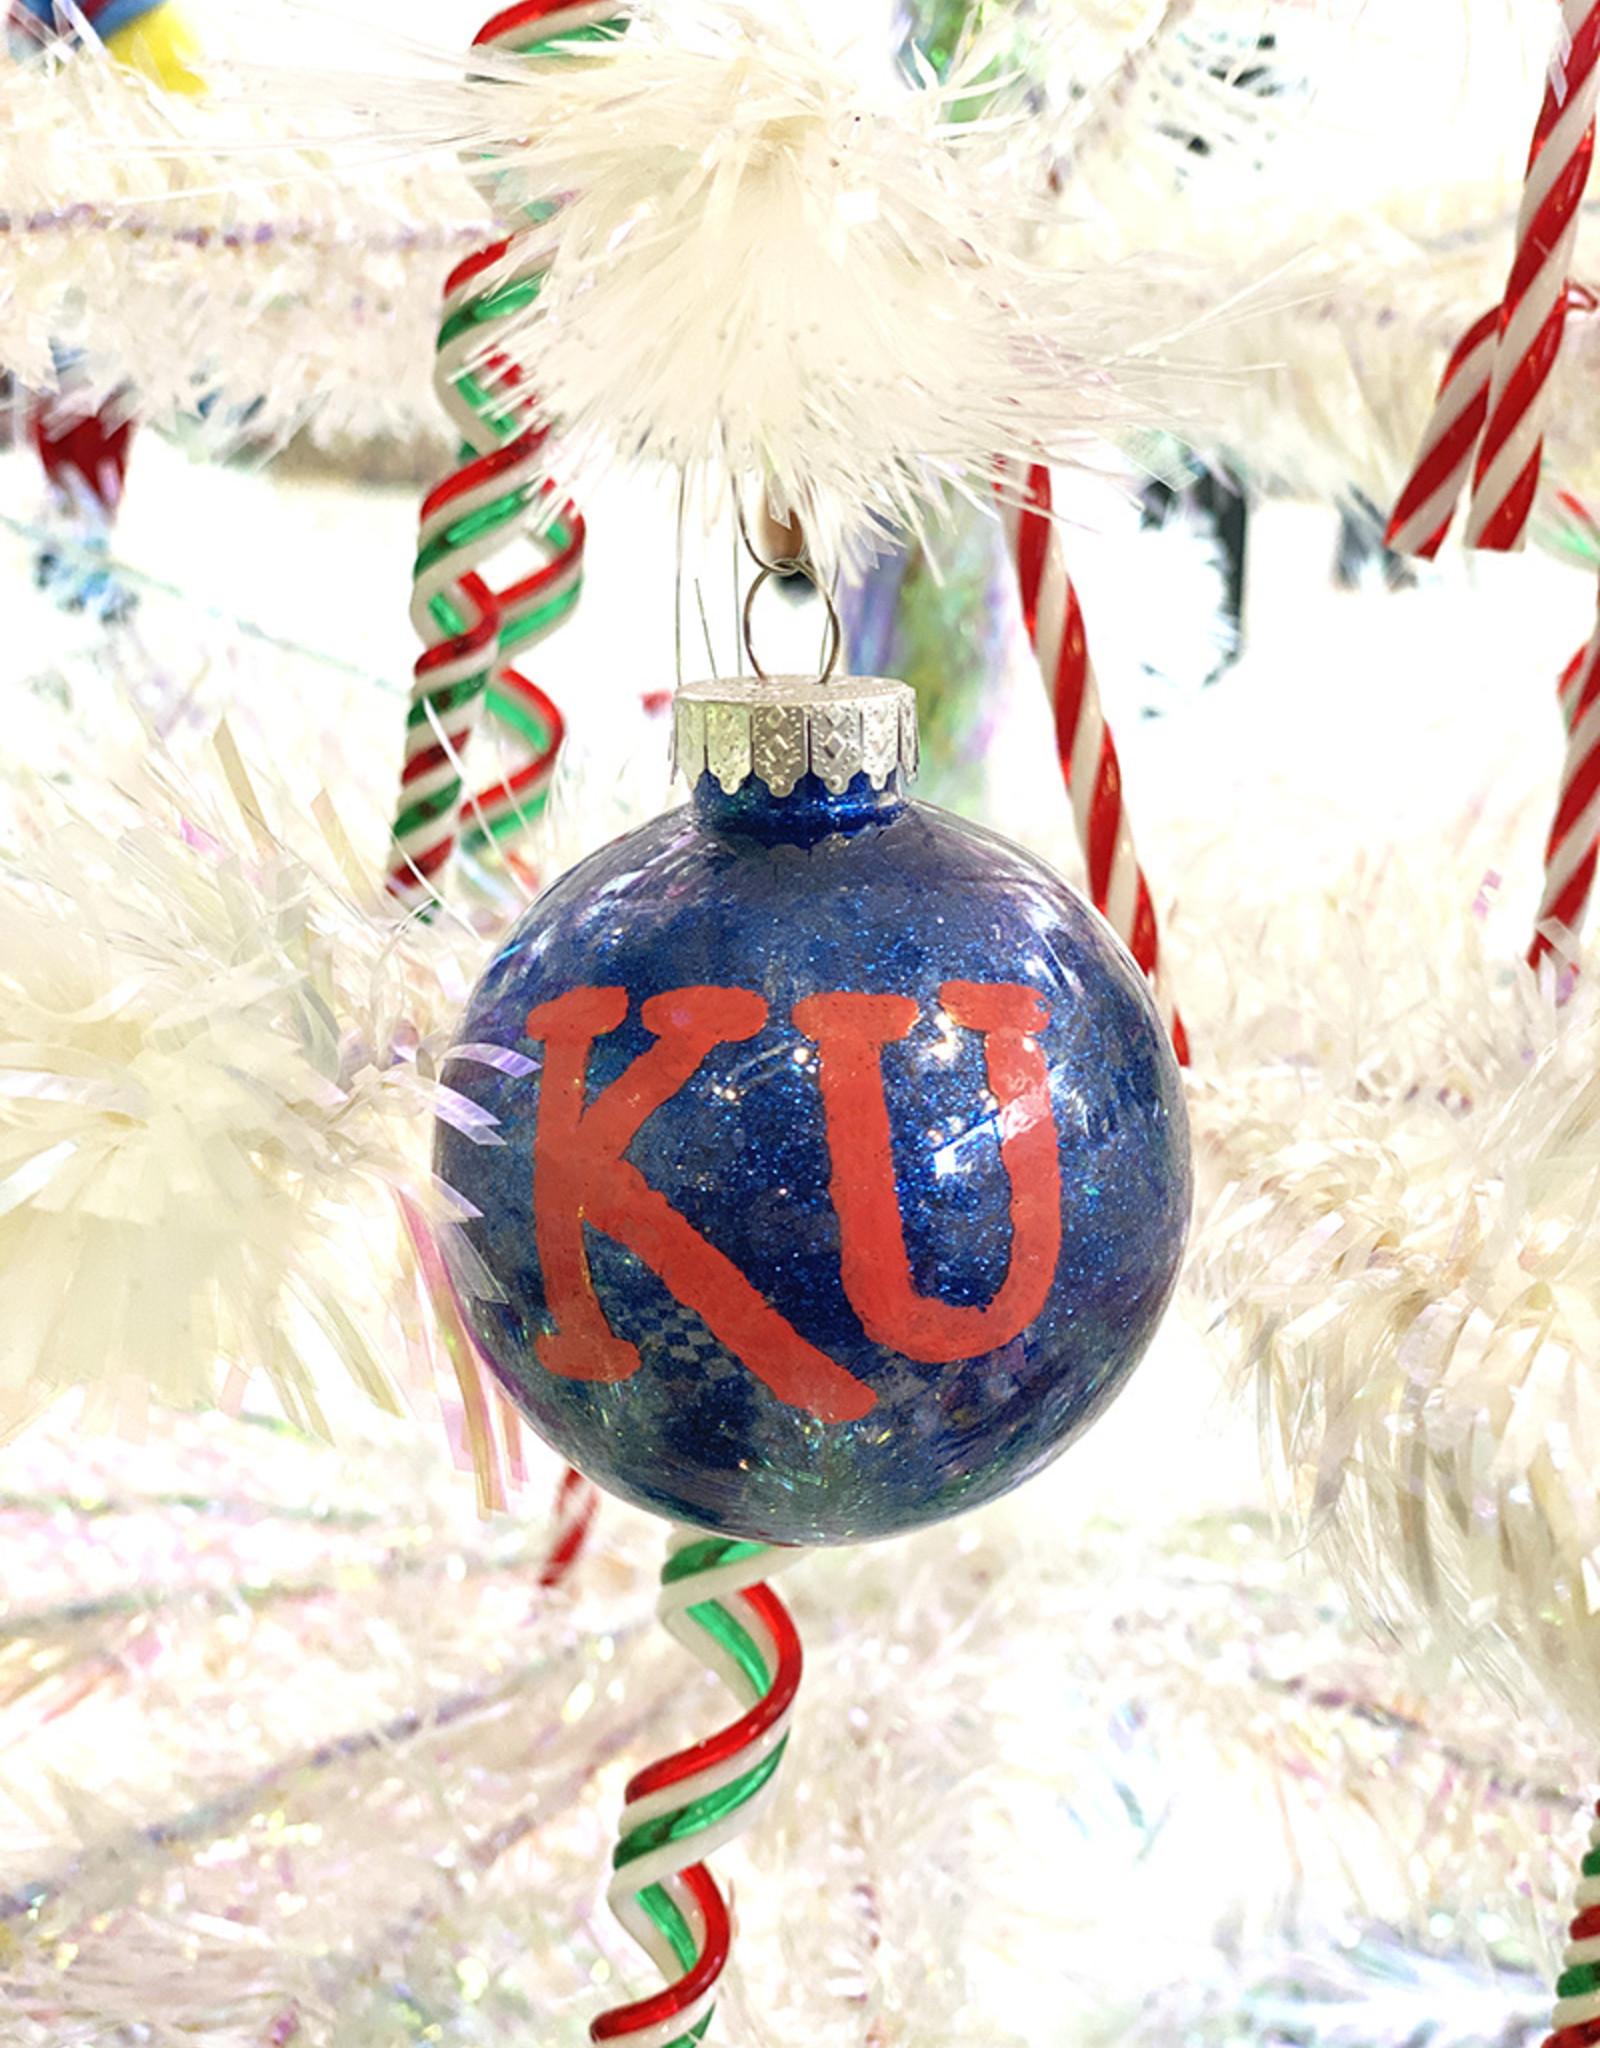 Reciprocity Designs KU Ornaments by Reciprocity Designs